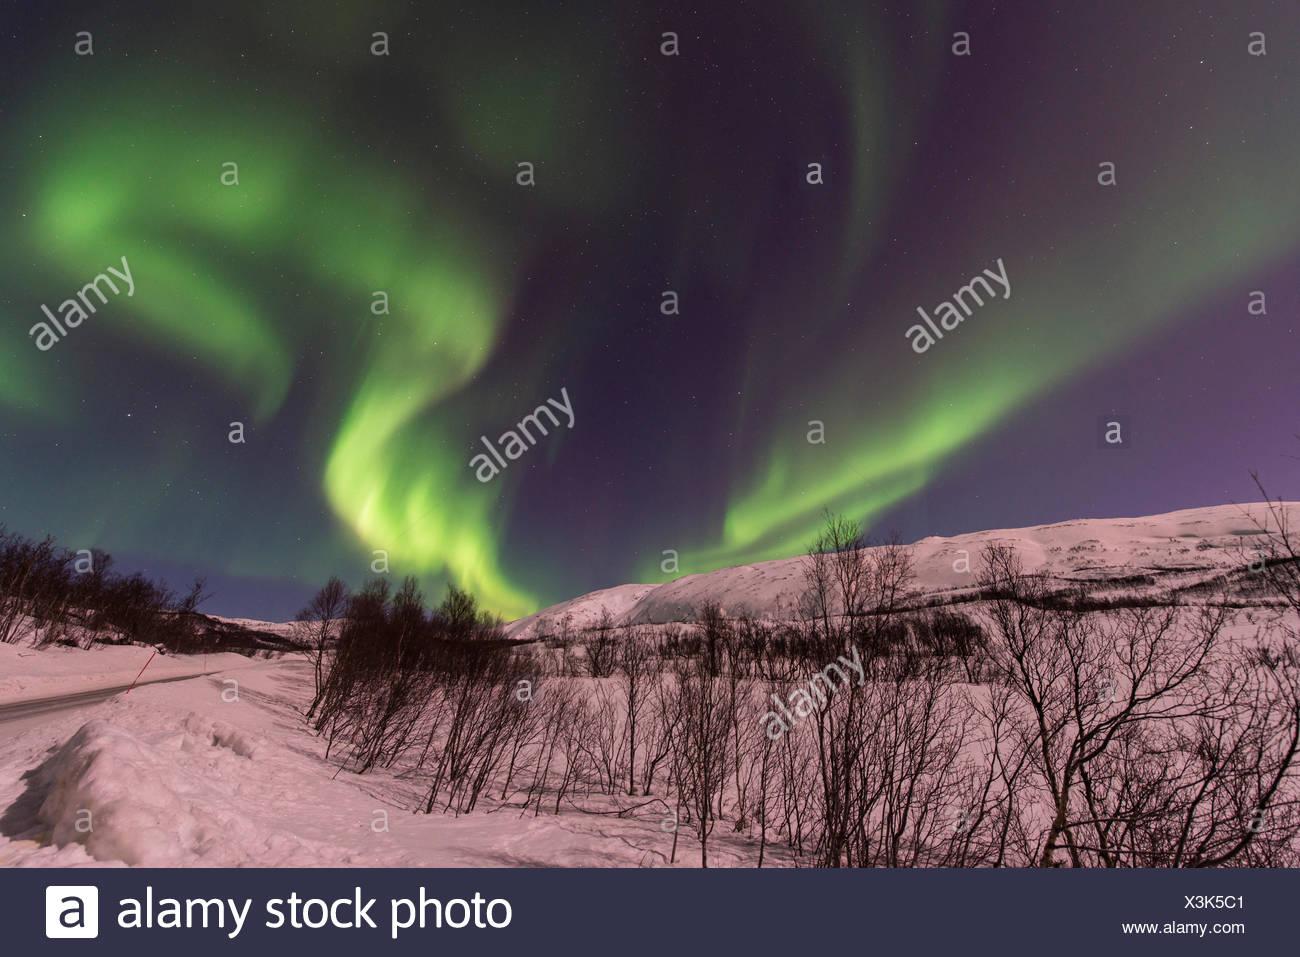 Aurora eddy nel paesaggio invernale, Norvegia, Troms, Finnvikdalen Foto Stock